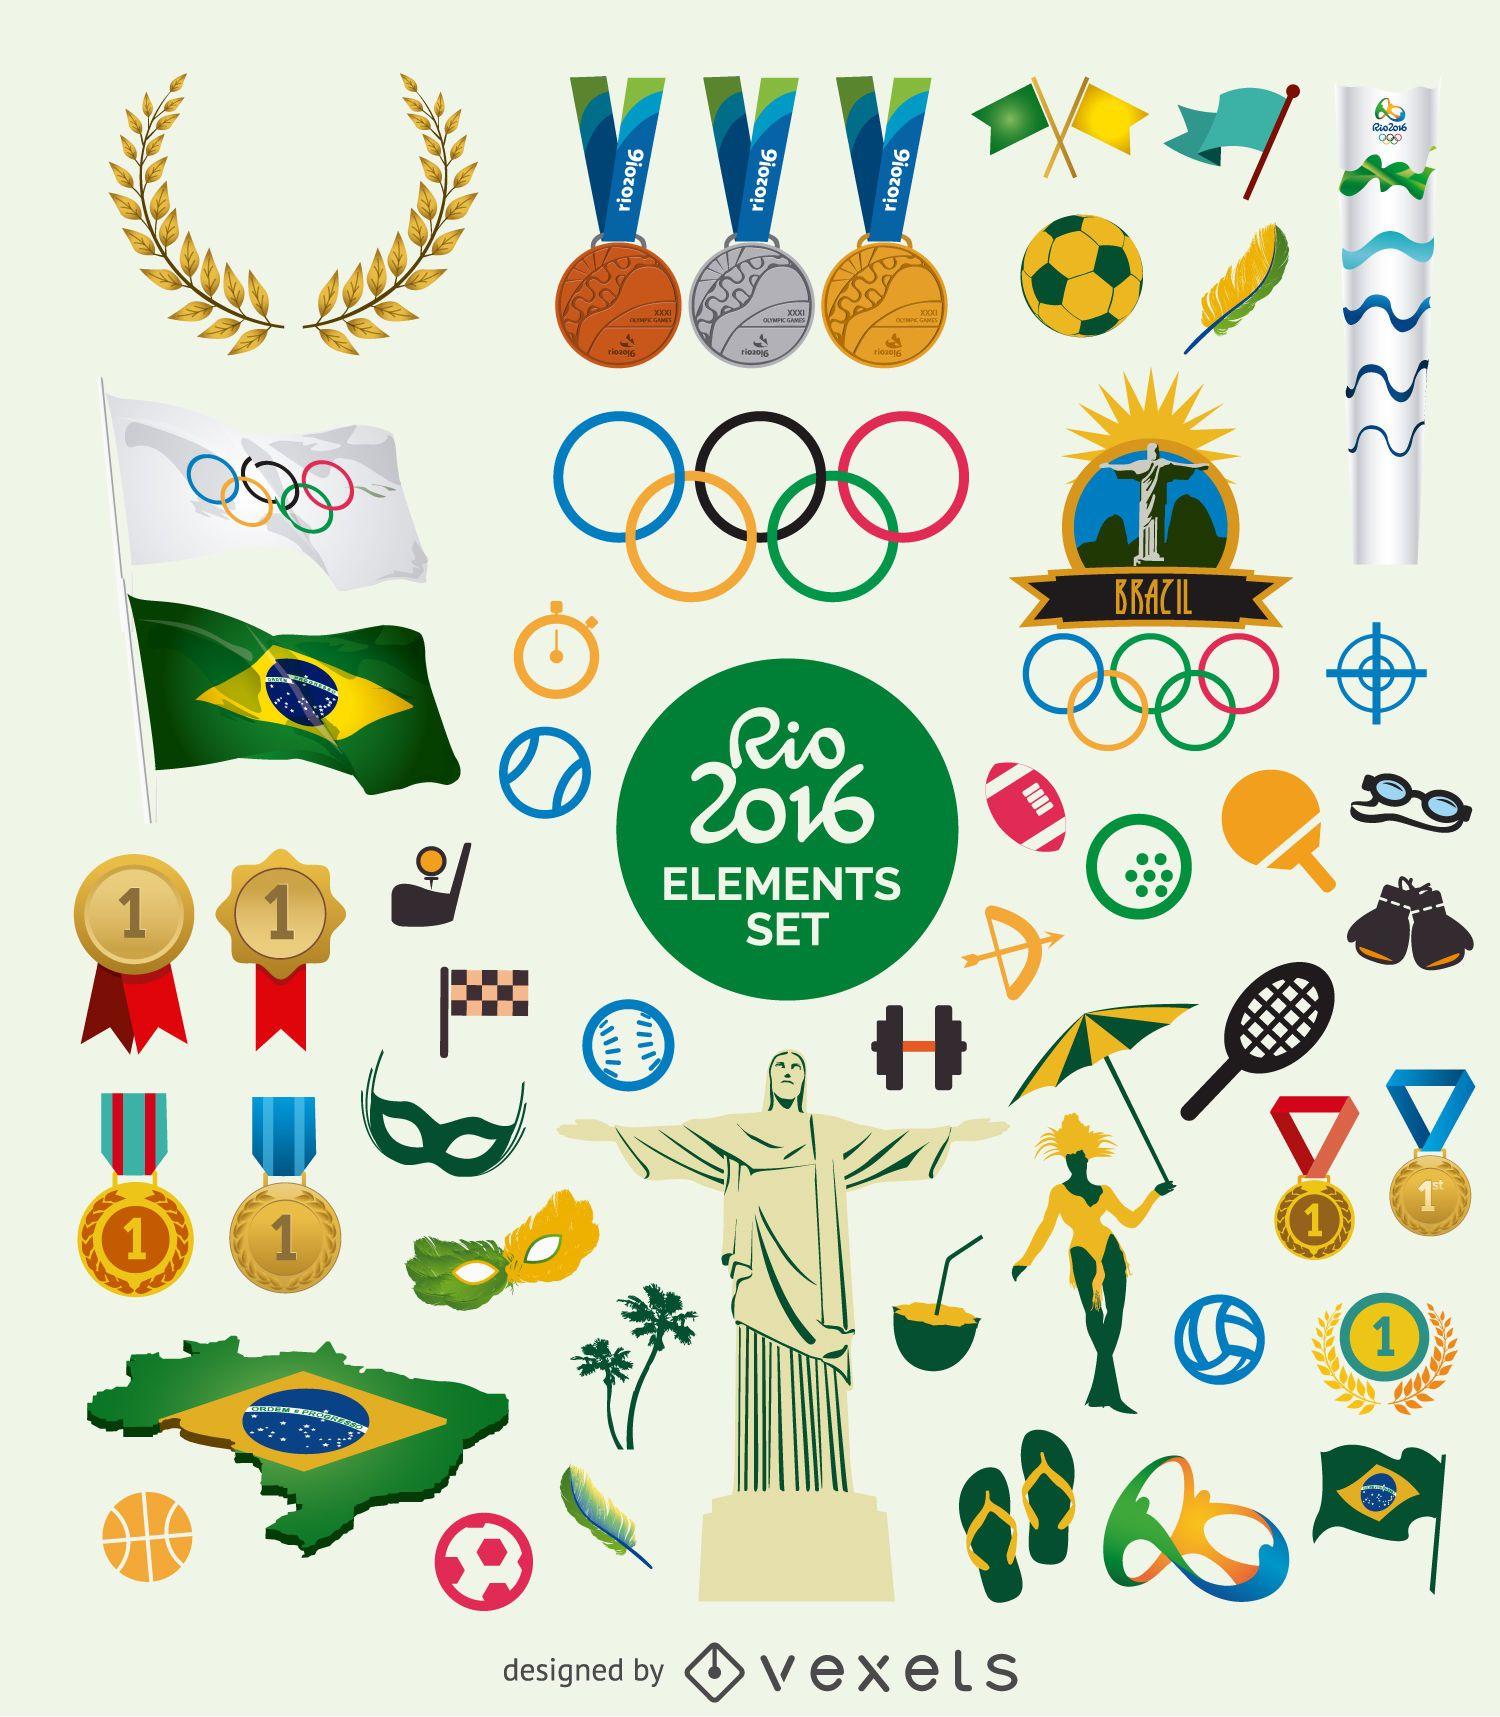 Rio 2016 element set